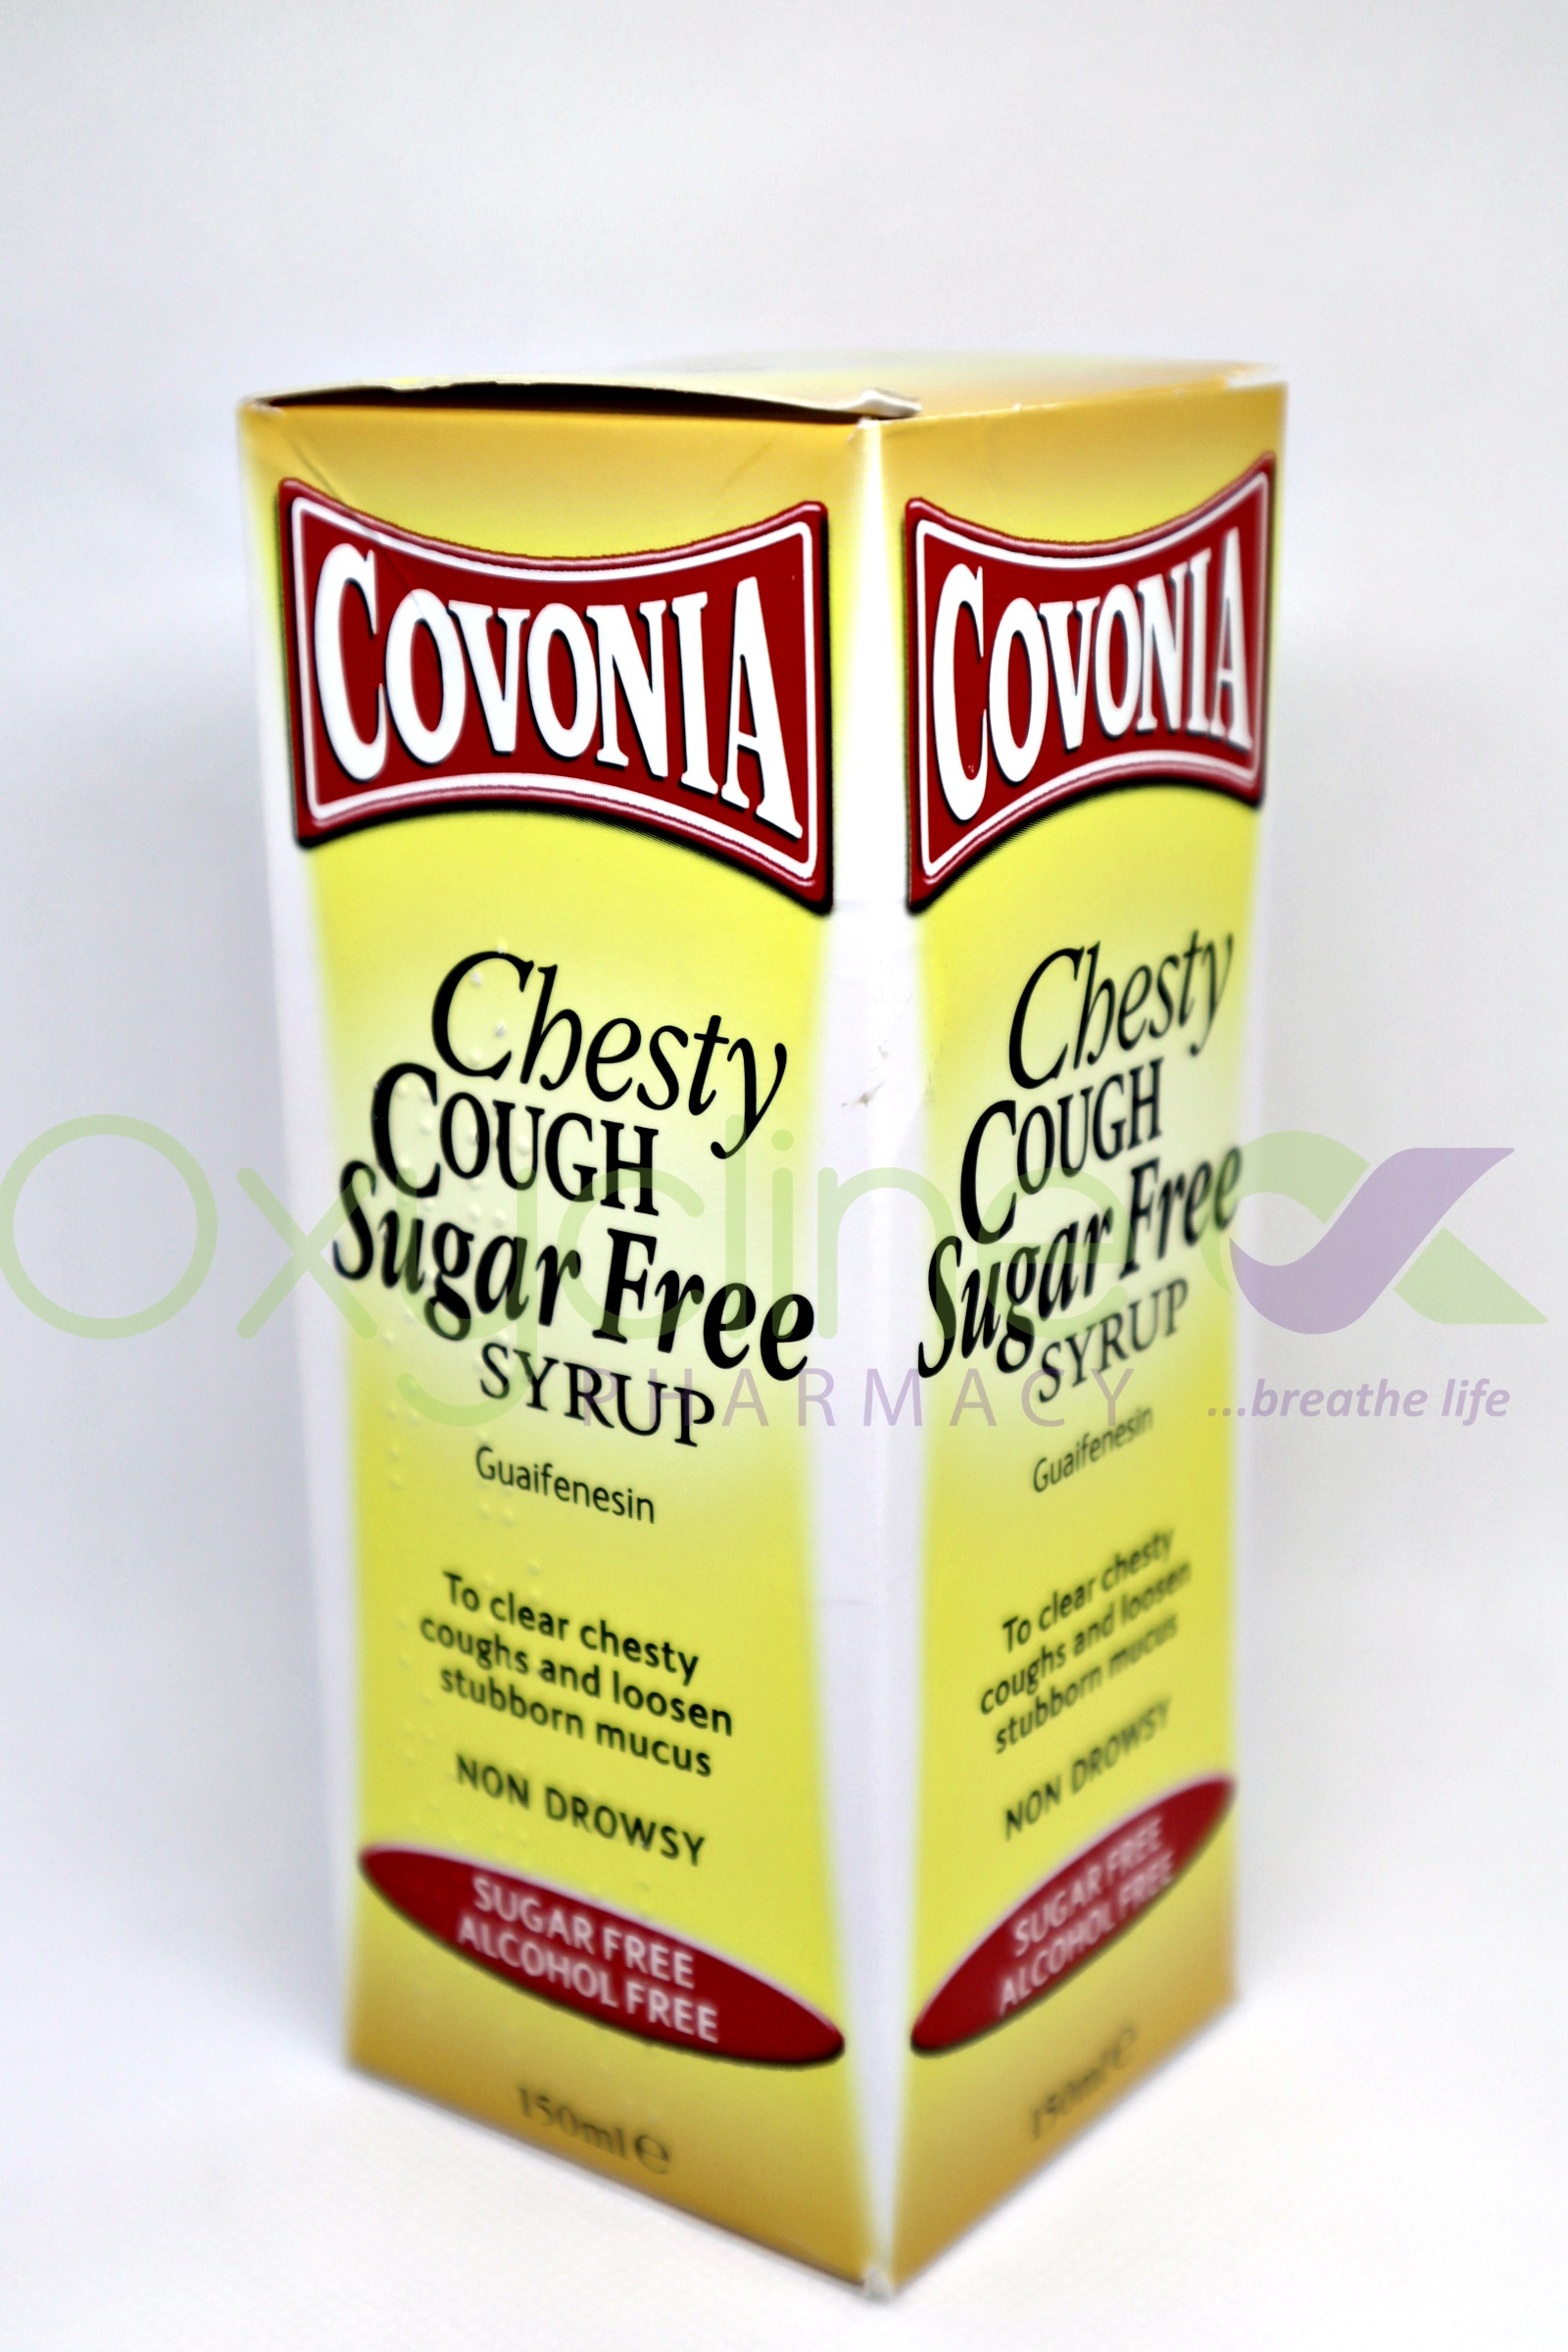 Covonia Chesty Sugar Free